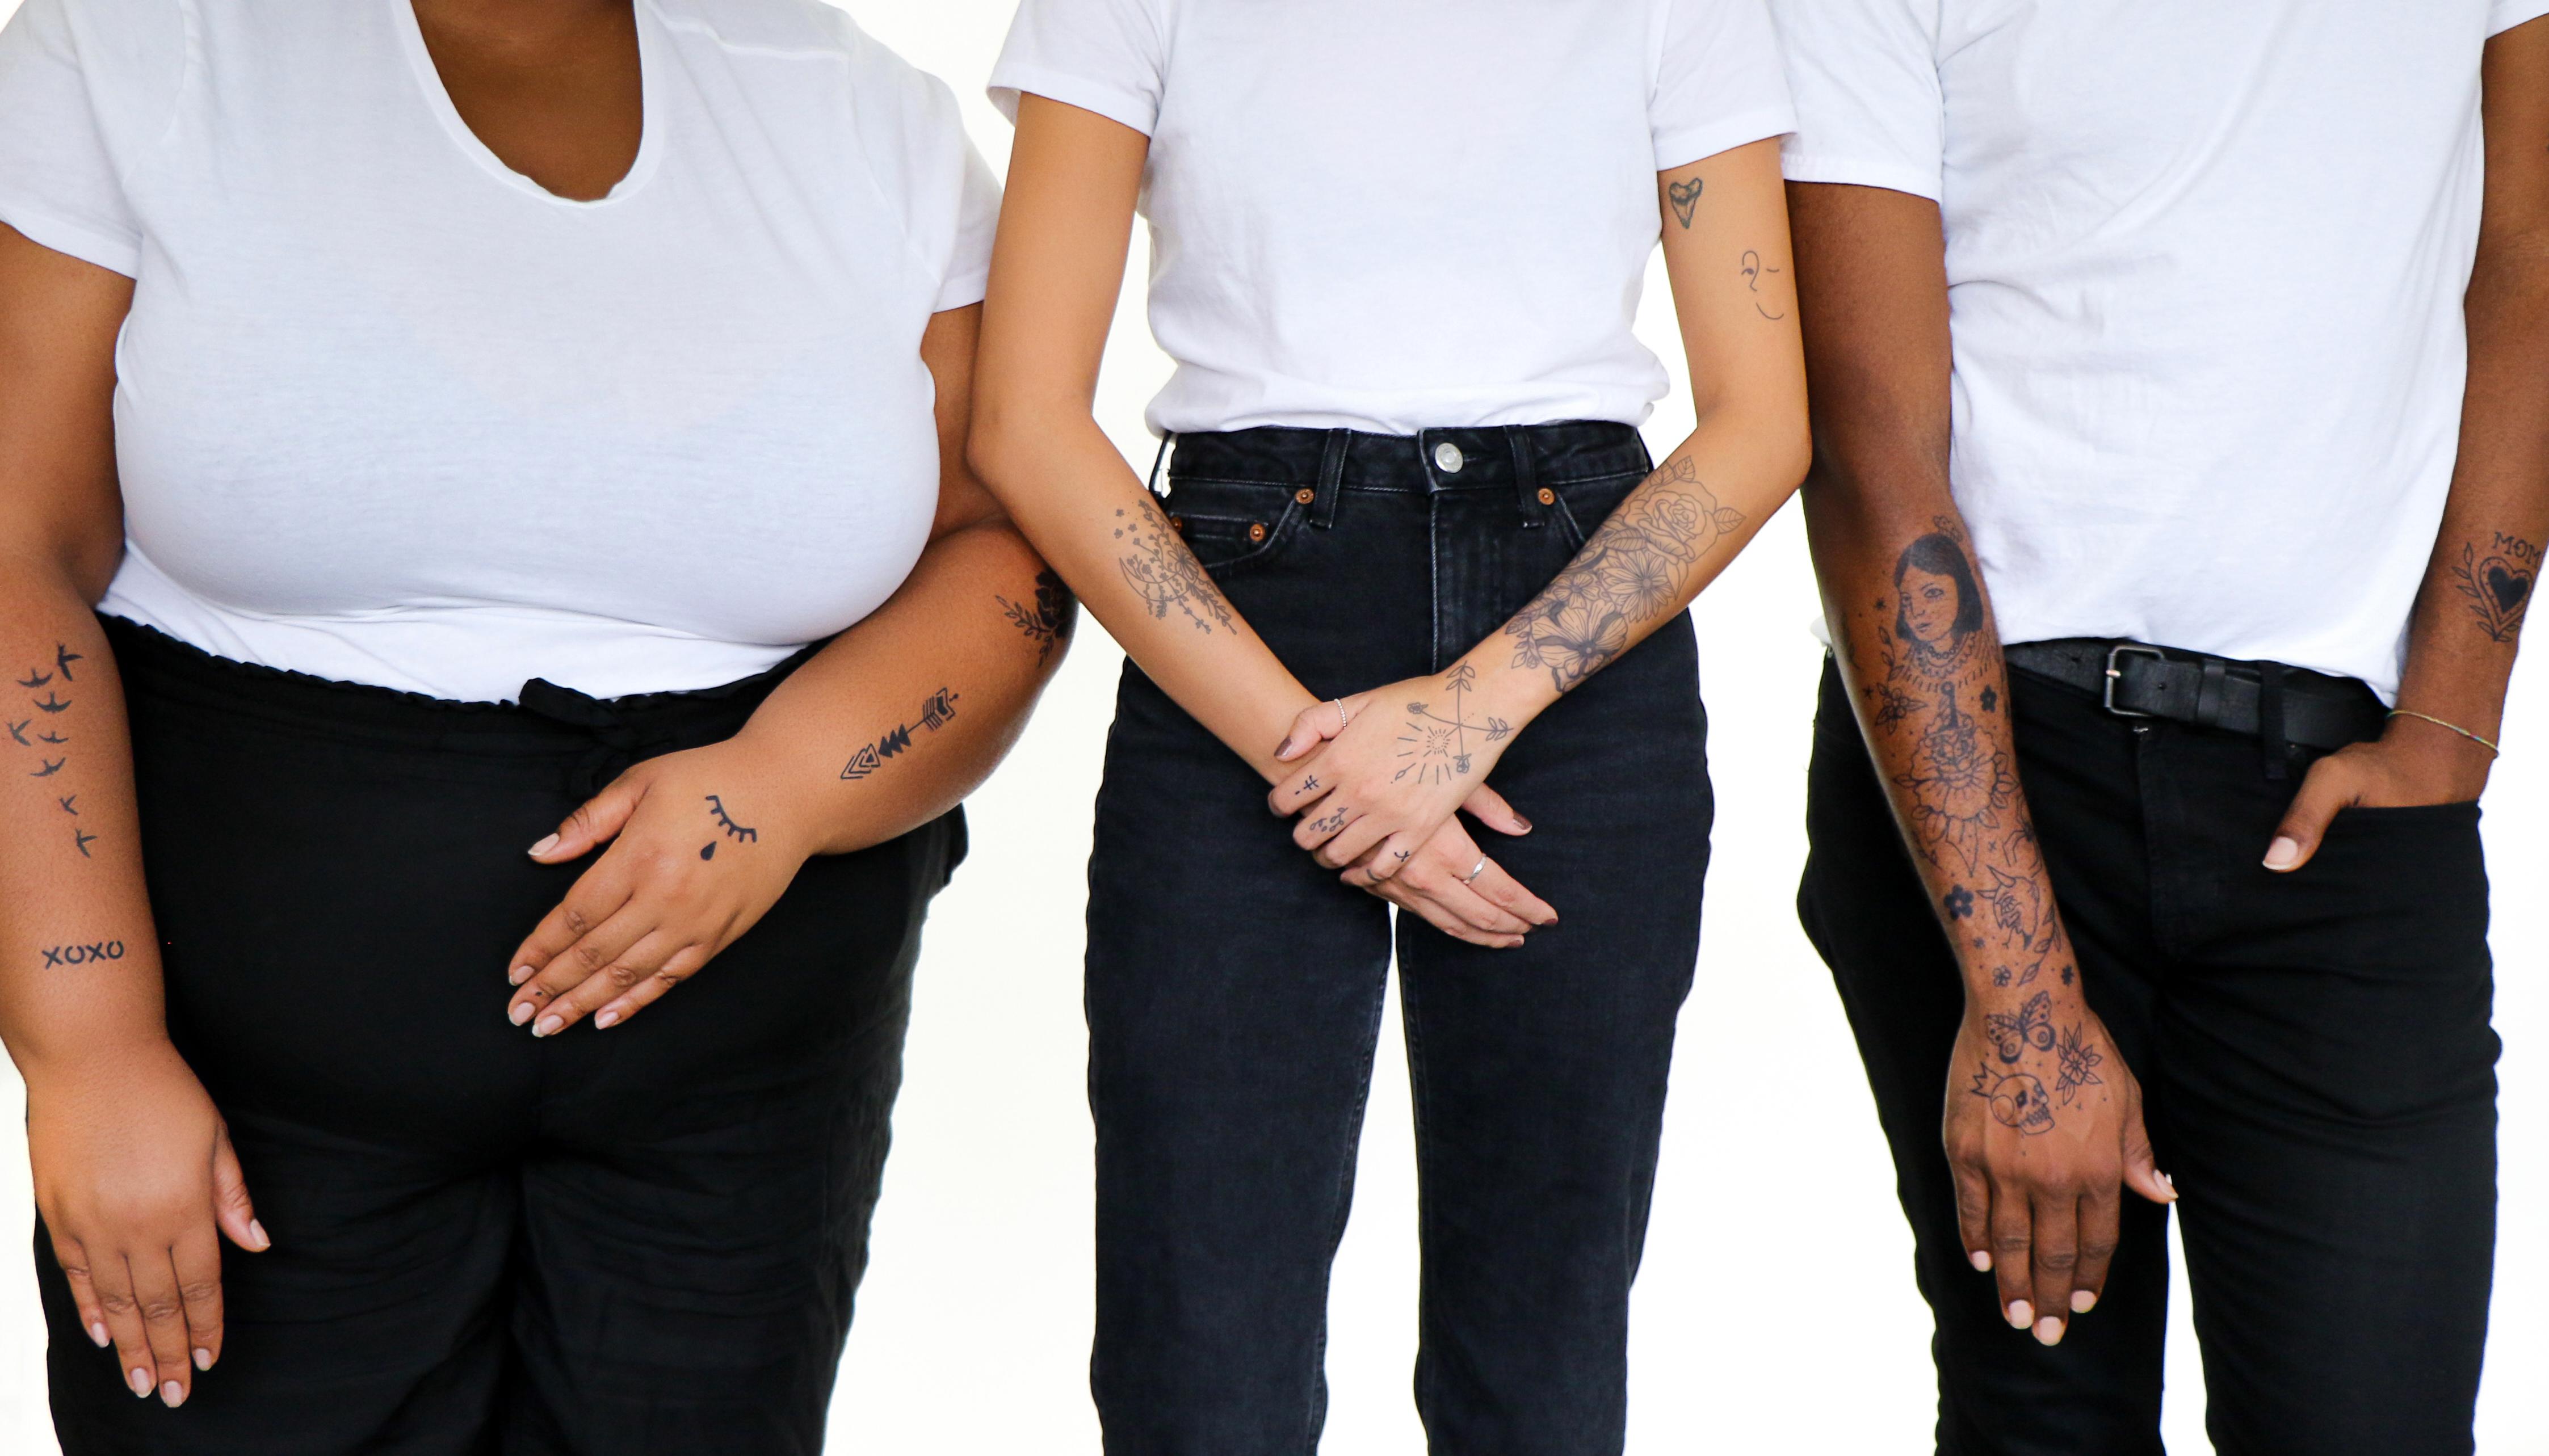 tatuajes temporales - inkbox - Logia Barcelona